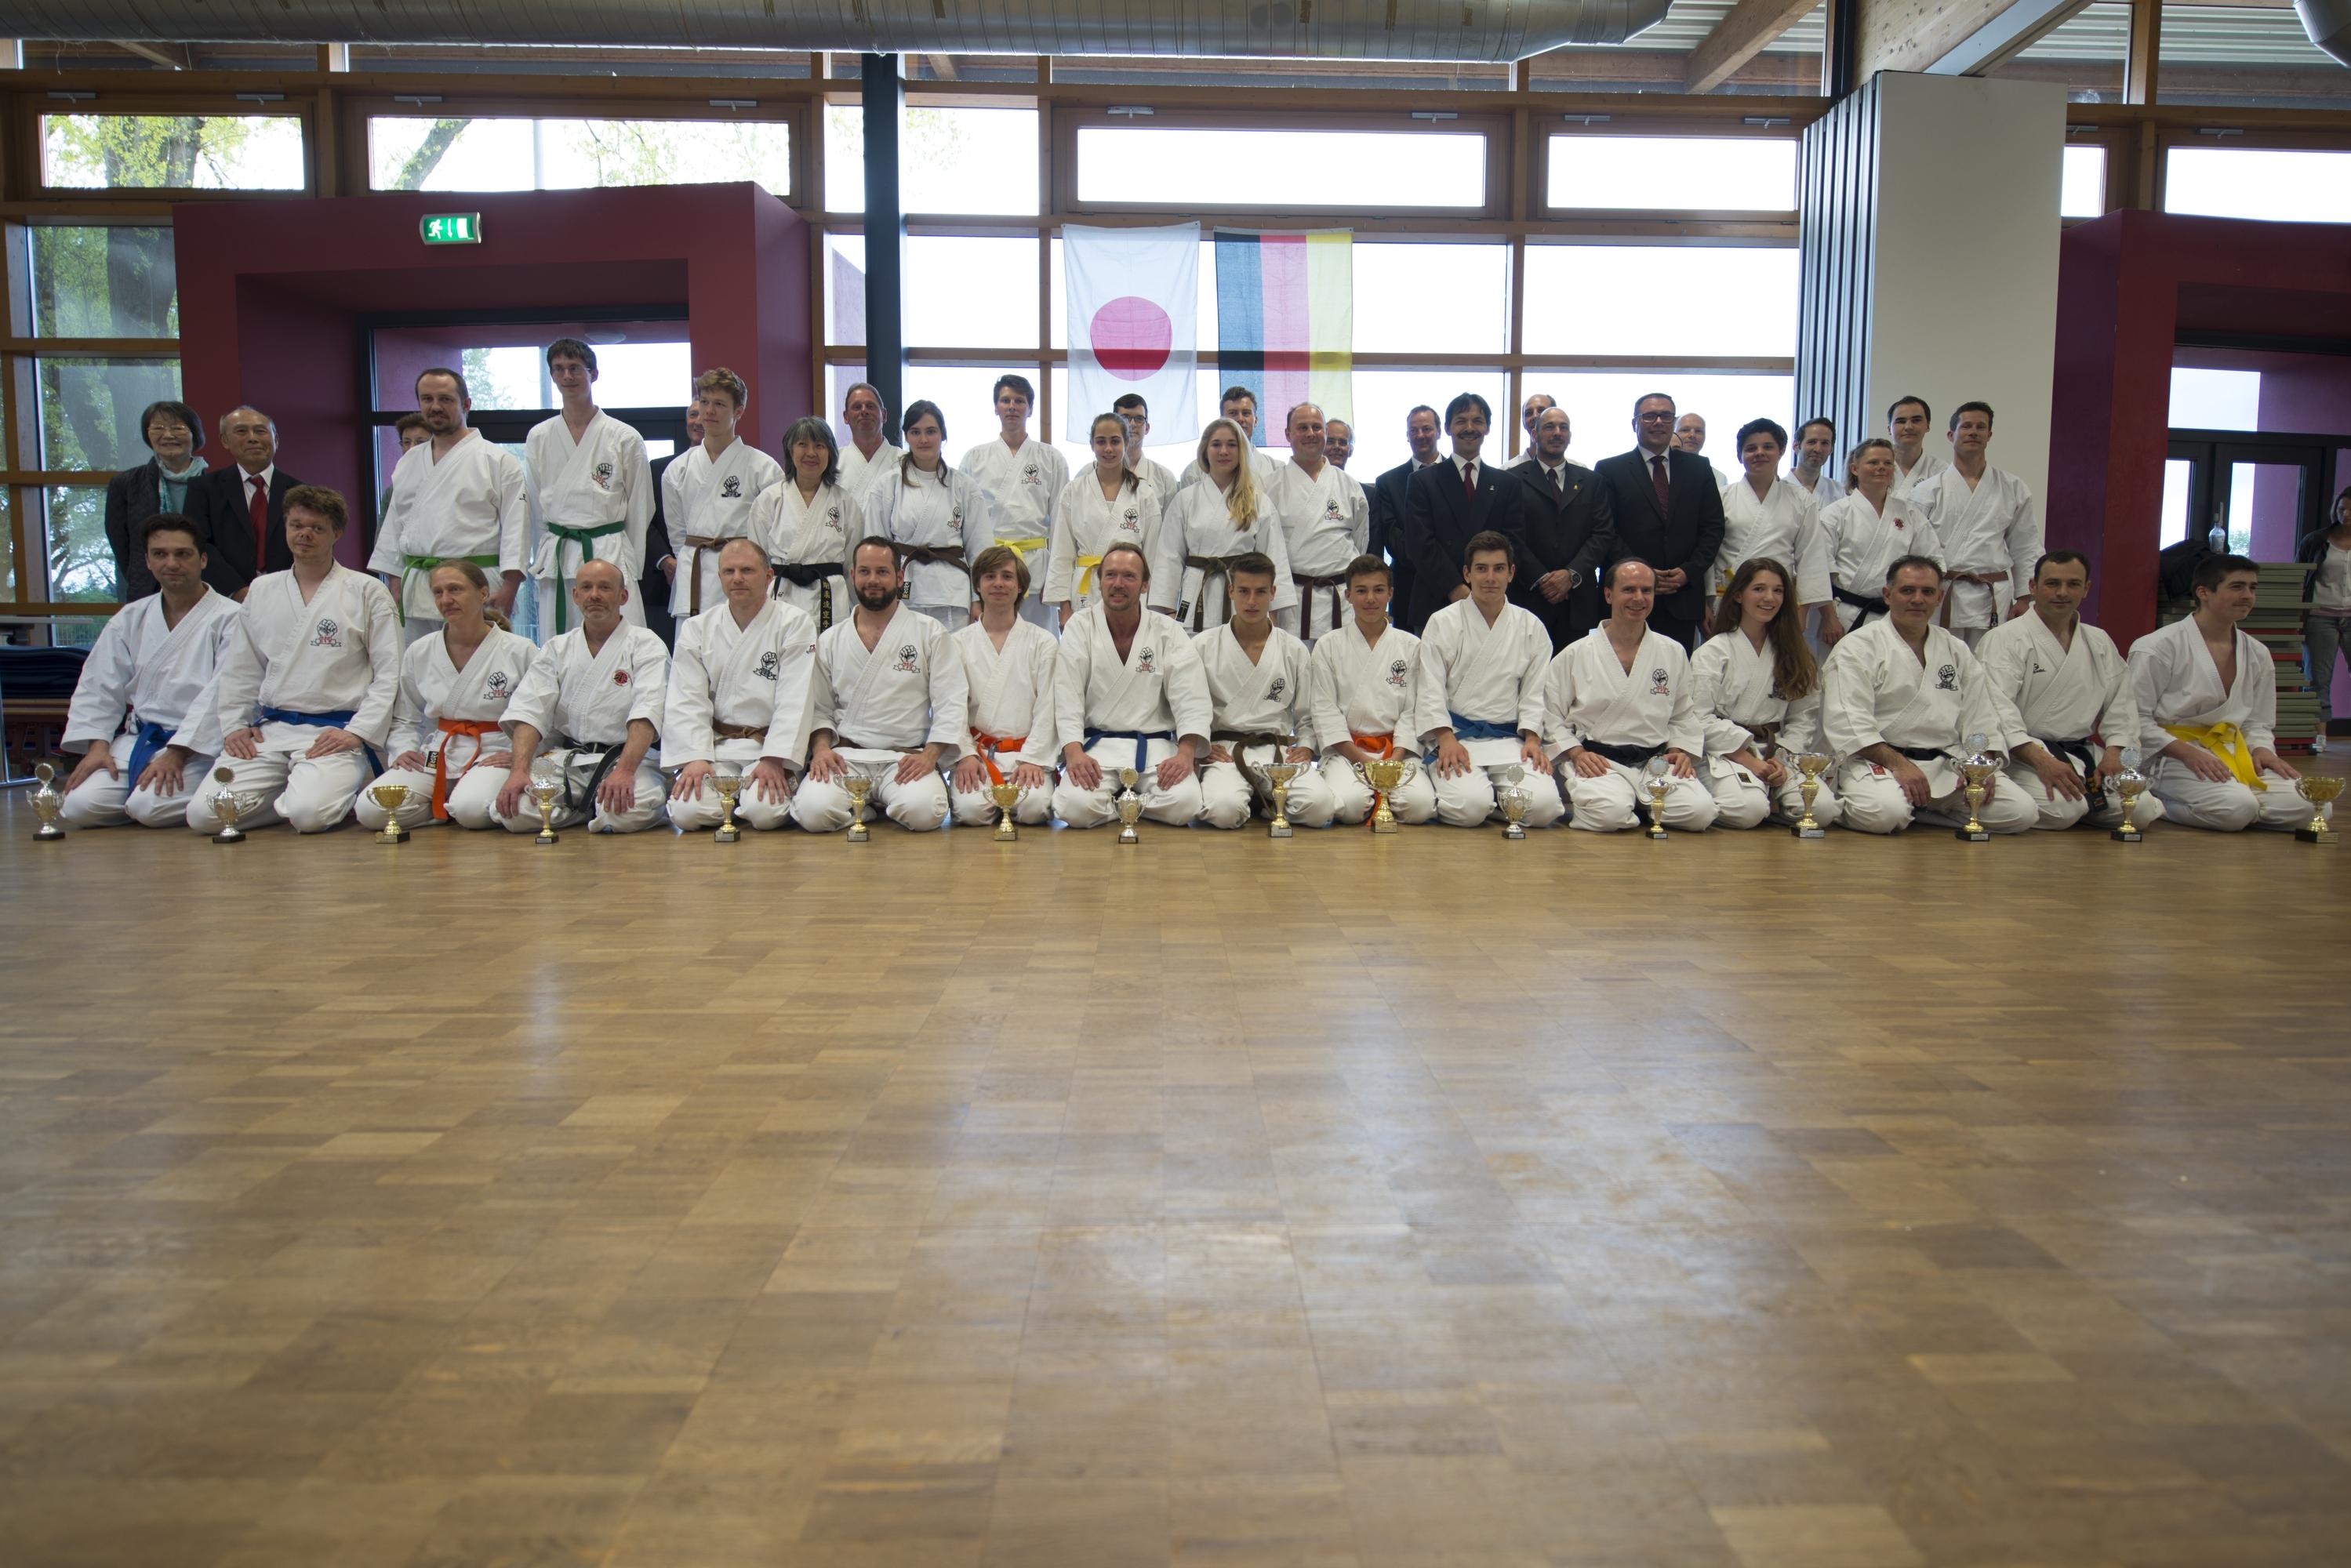 2016-04-26 Kata Turnier Kaarst 366